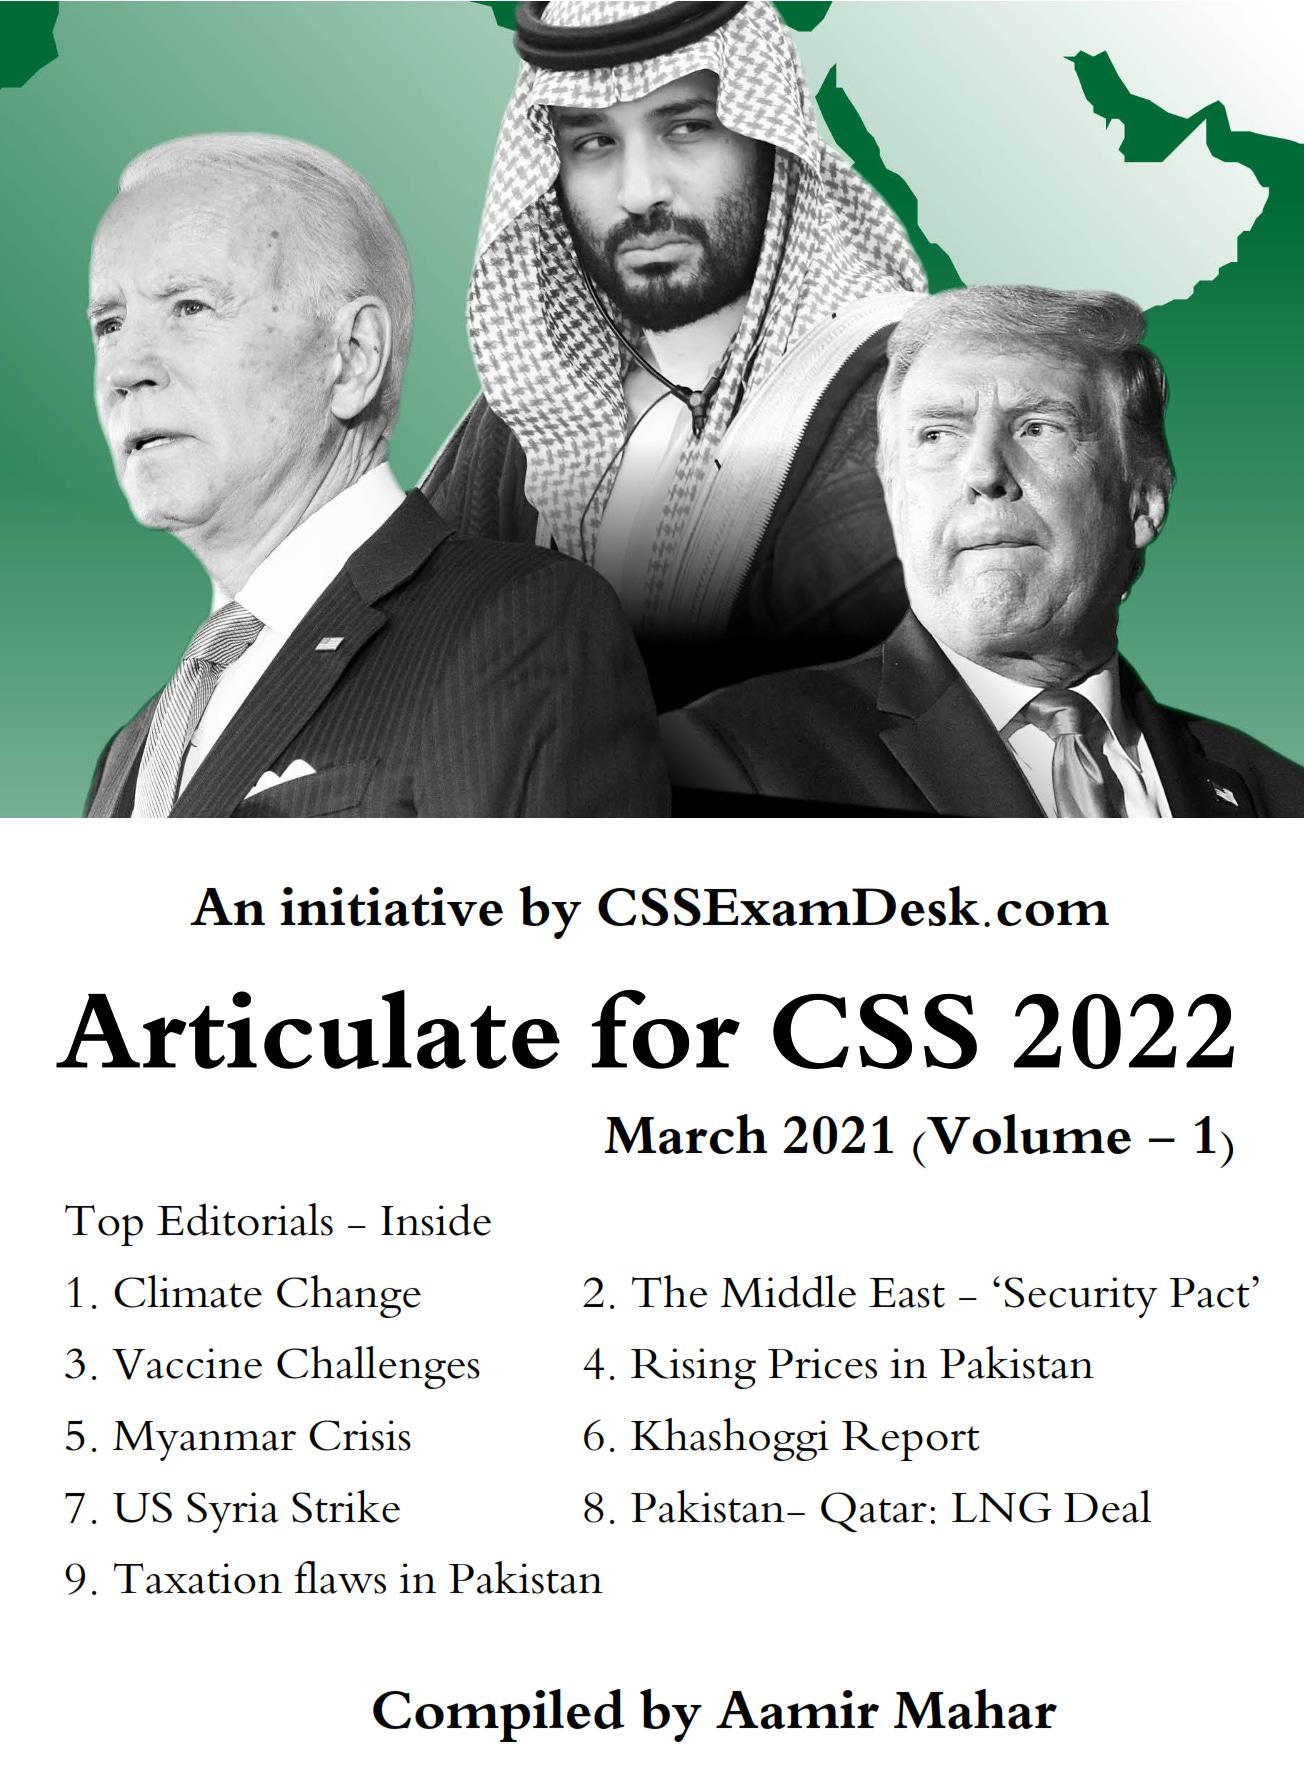 CSS 2022 Articulate – I